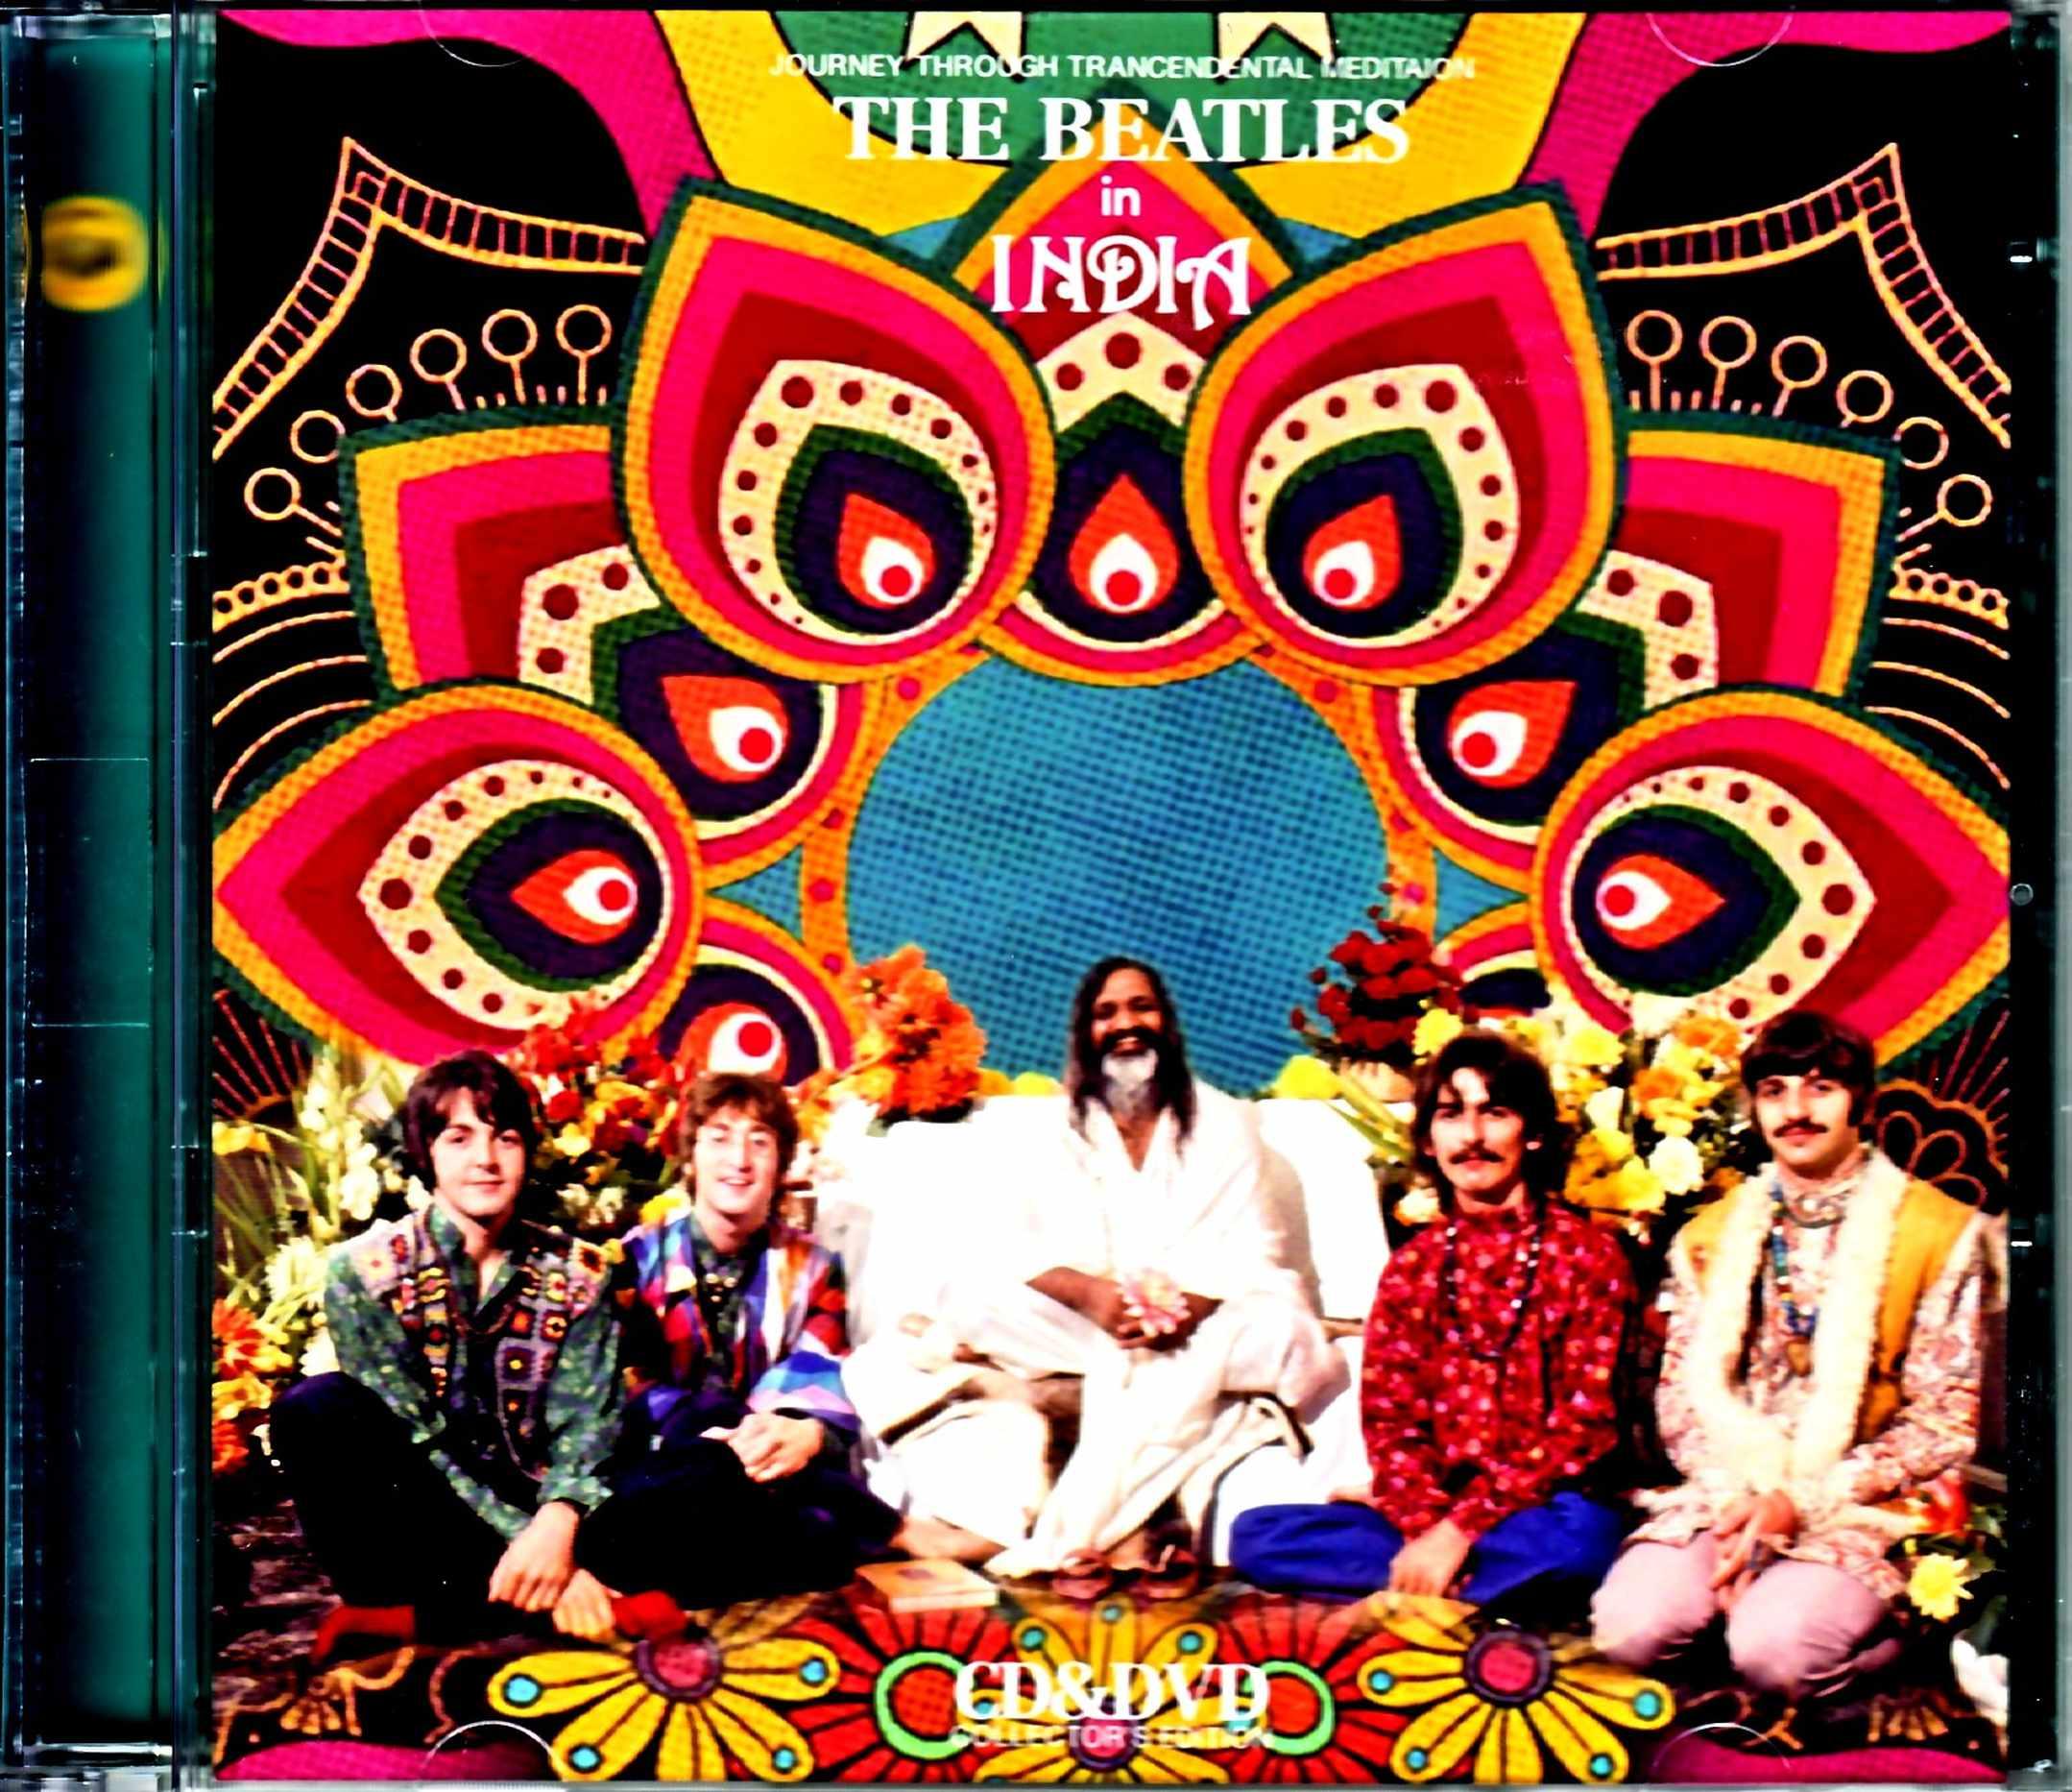 Beatles ビートルズ/インドへの瞑想の旅 in India Compilation 1968